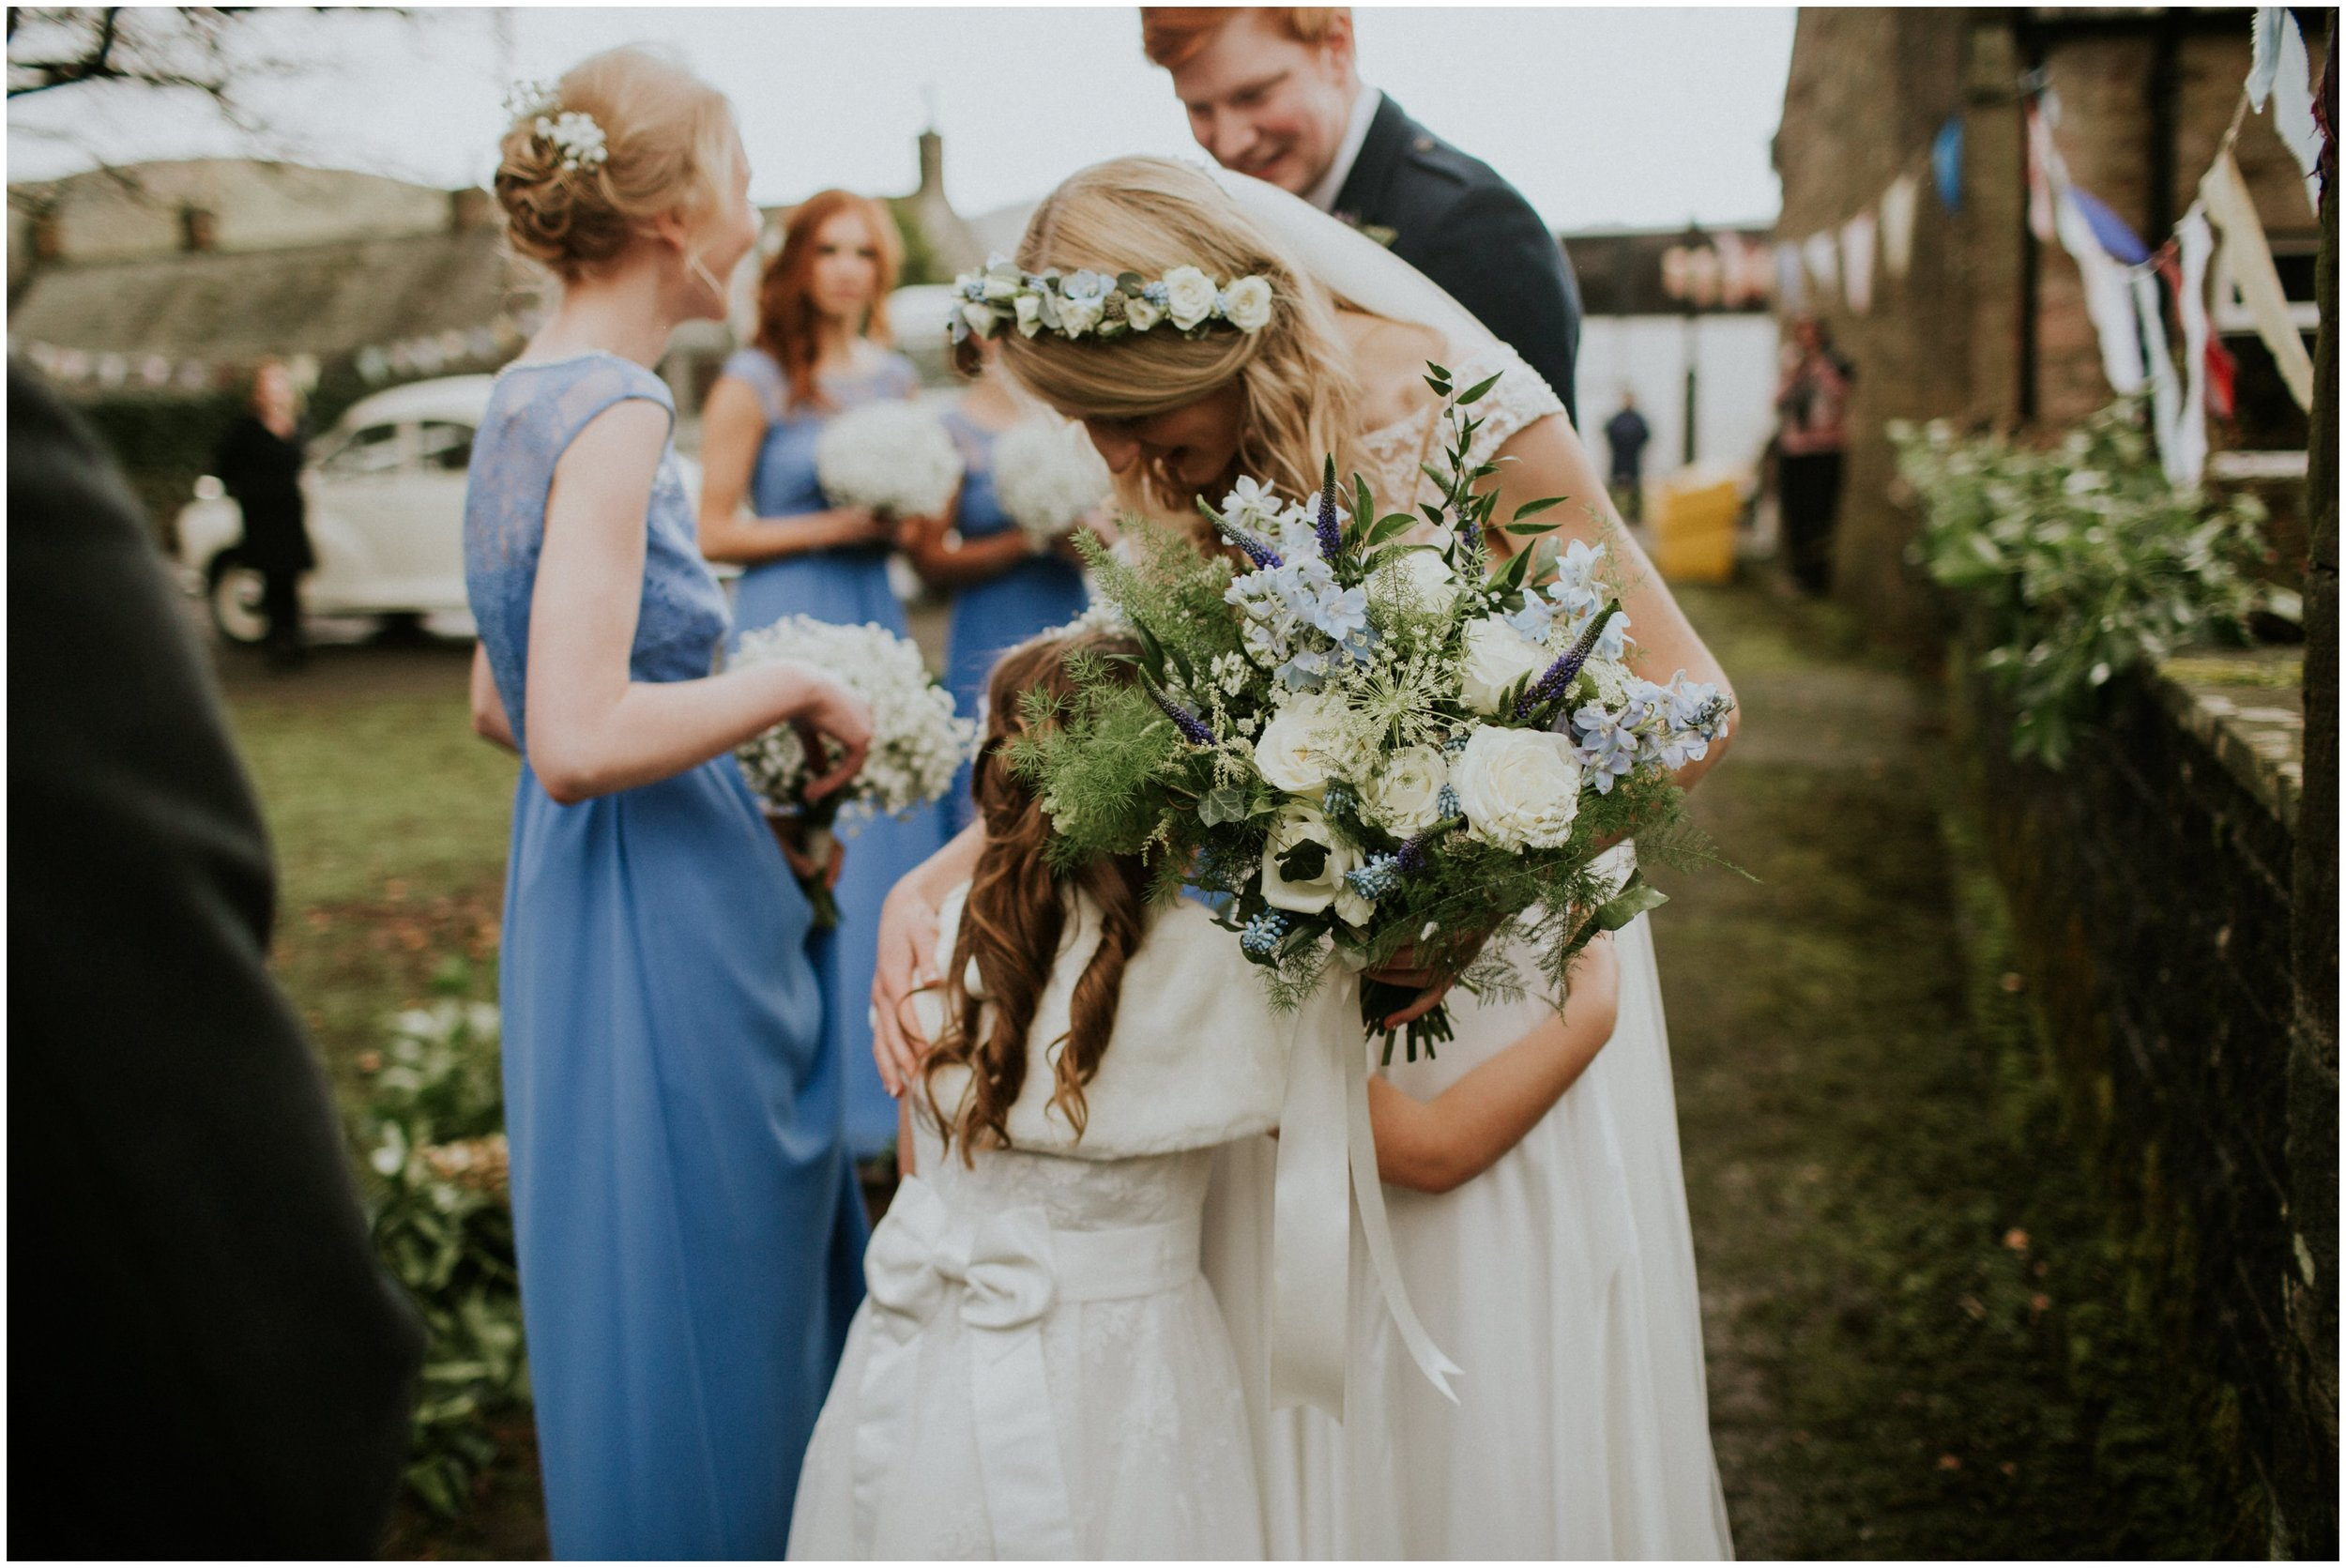 Photography 78 - Glasgow Wedding Photographer - Dave & Alana_0048.jpg